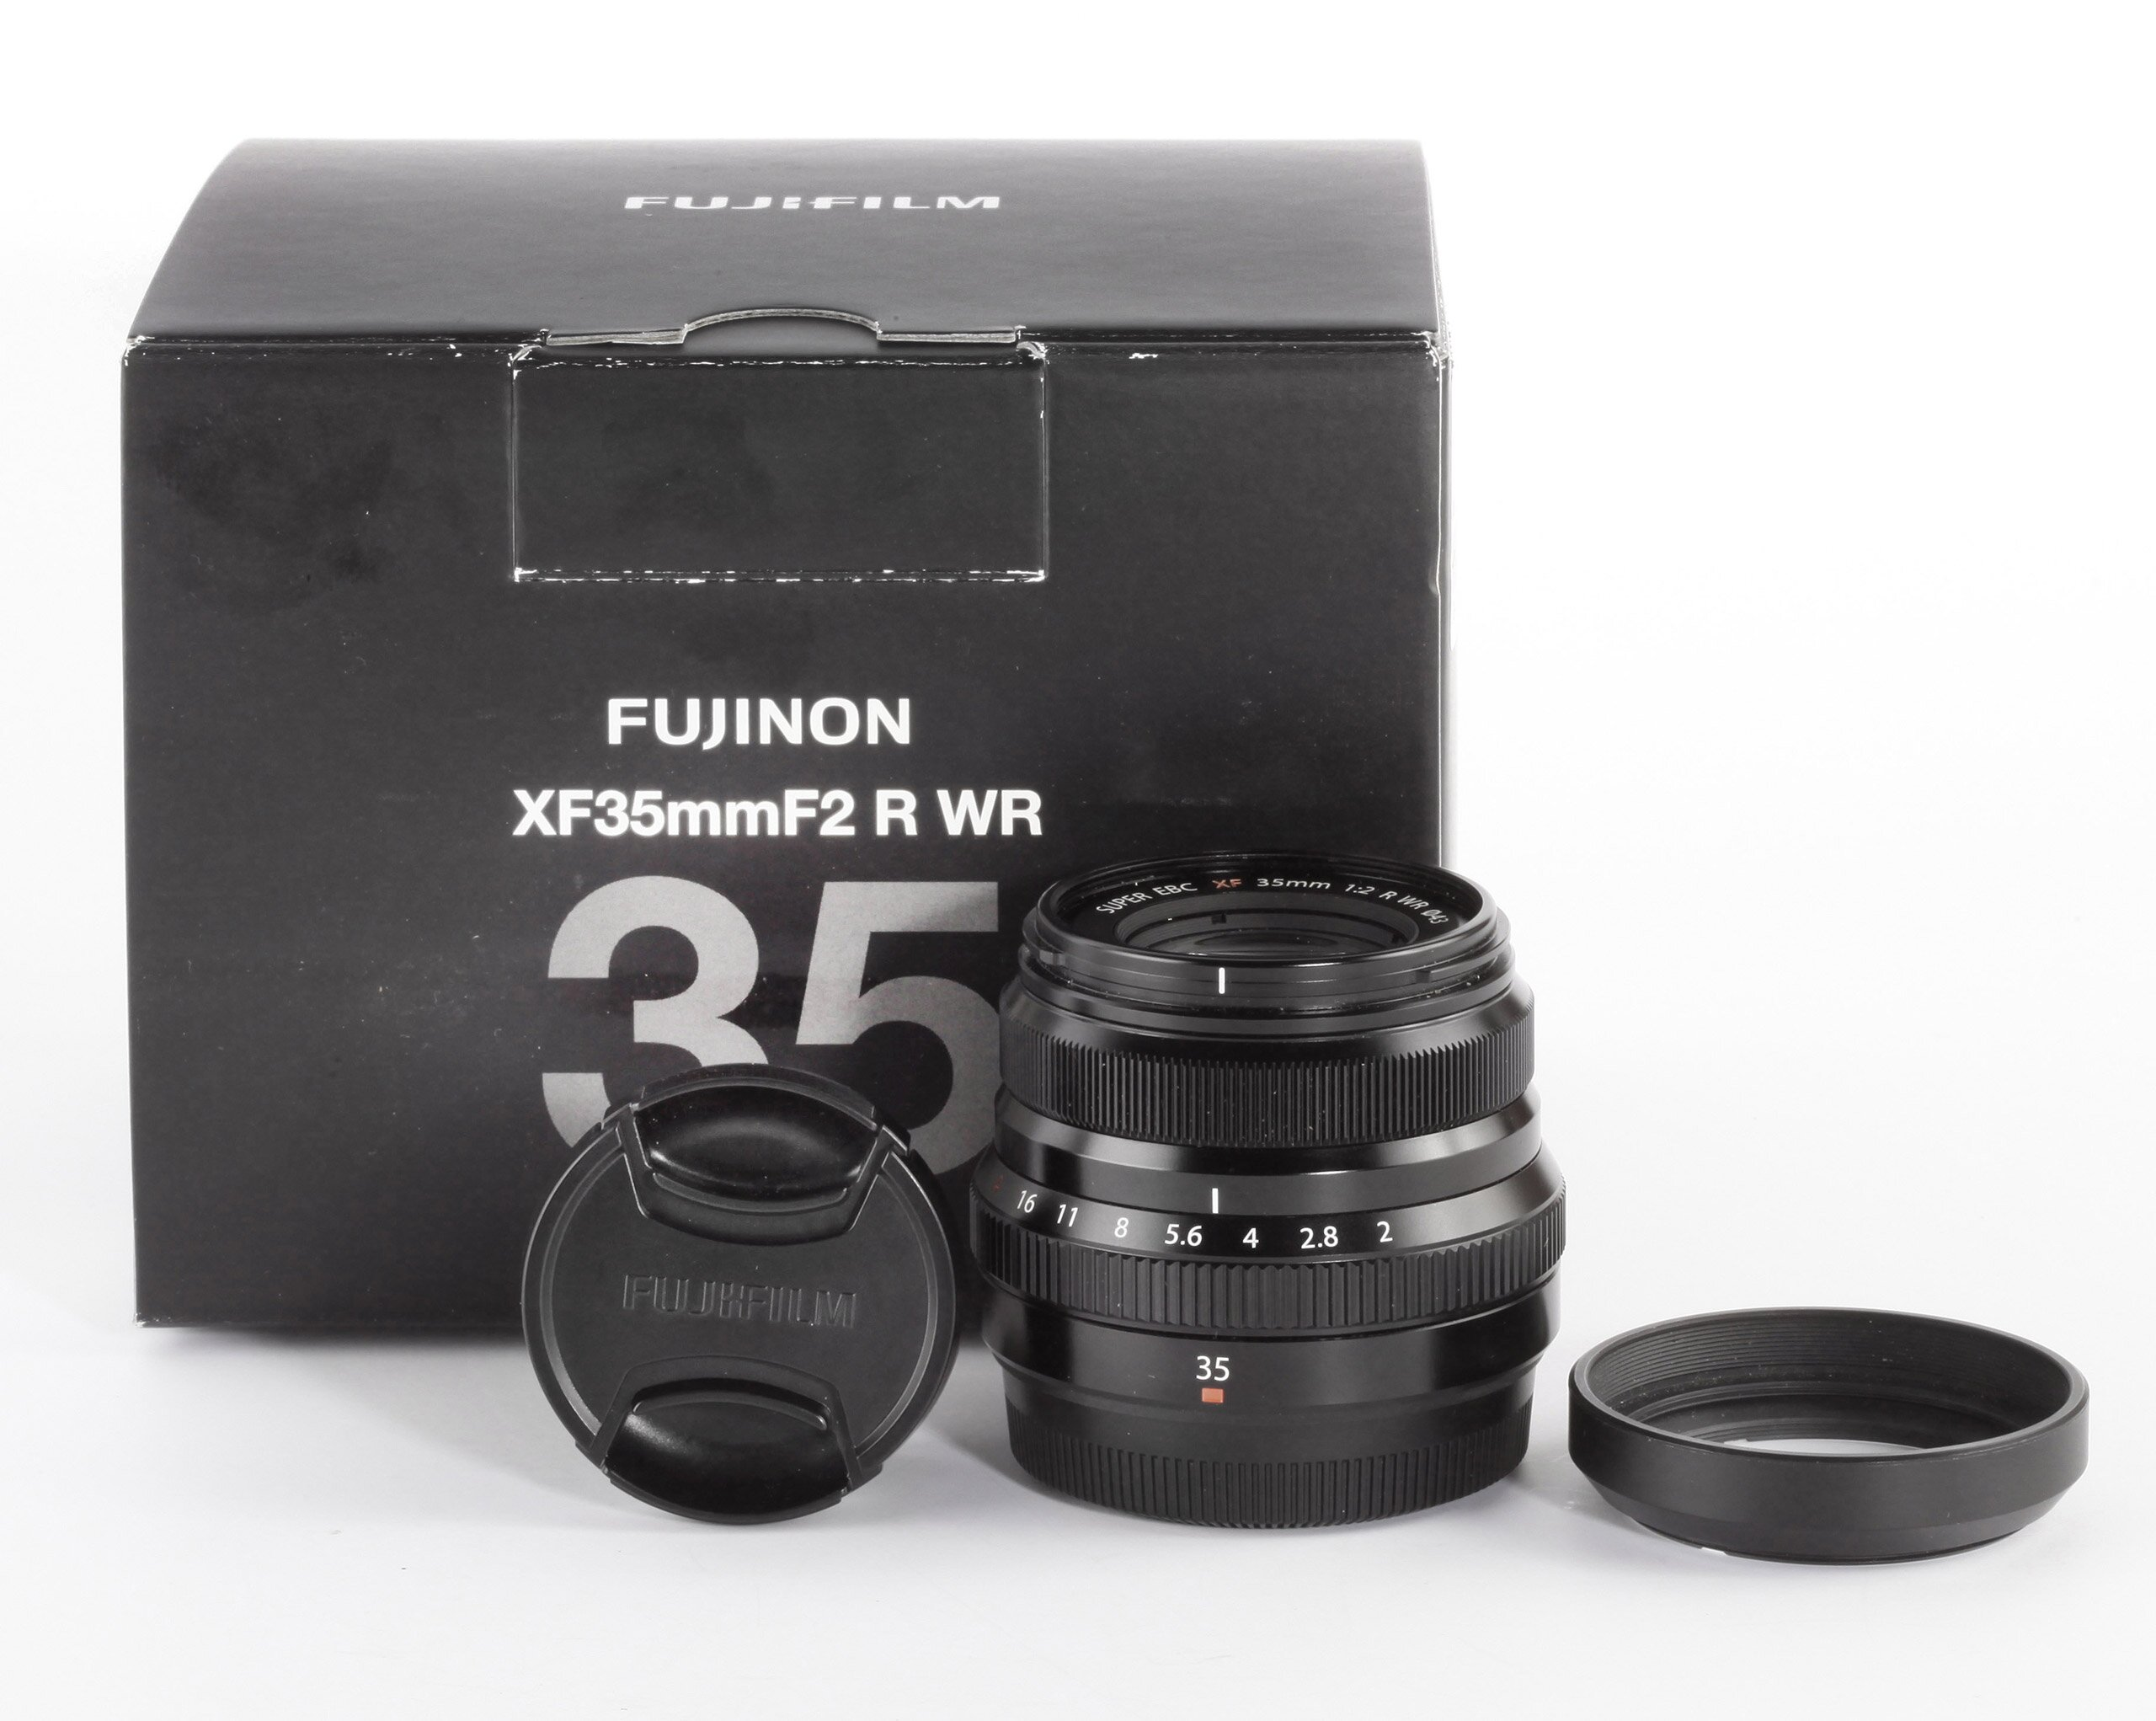 Fujifilm Fujinon XF 35mm/2,0 R WR